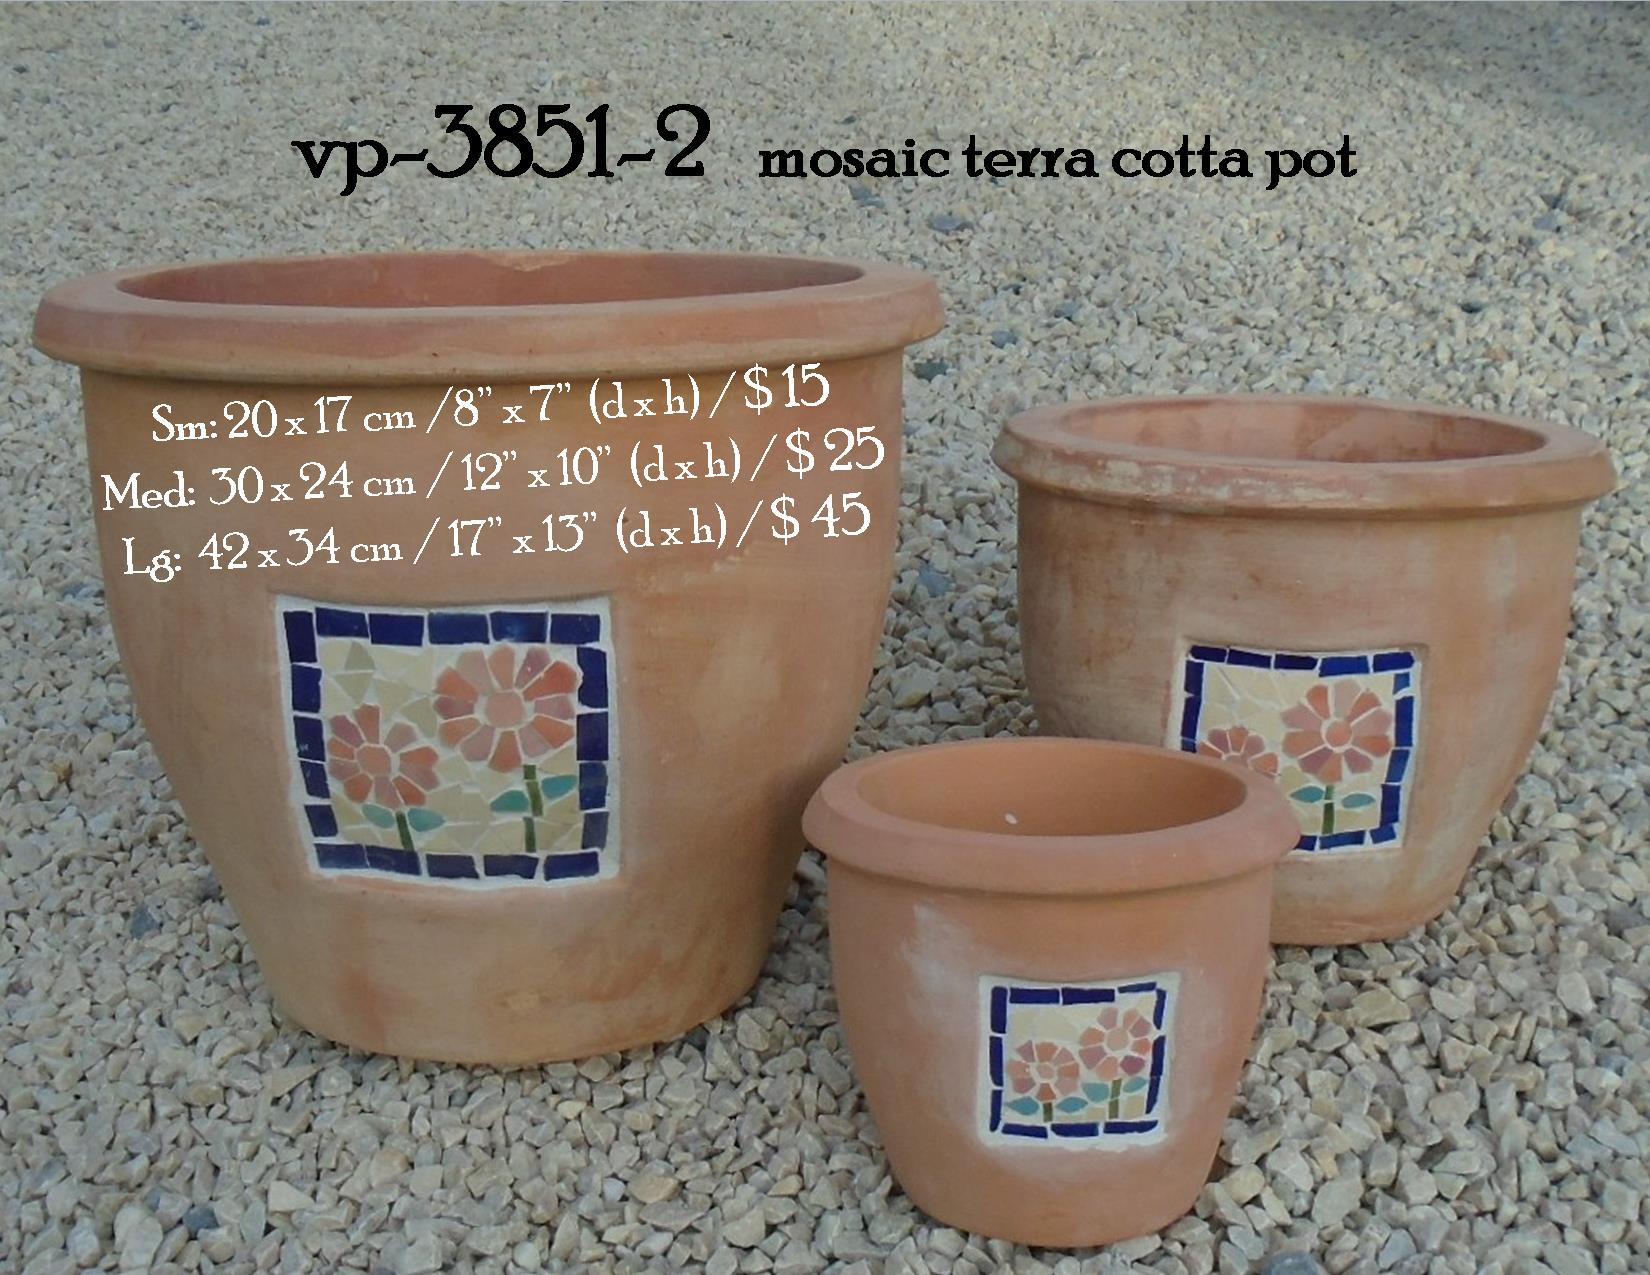 vp-3851-2   mosaic terra cotta pot